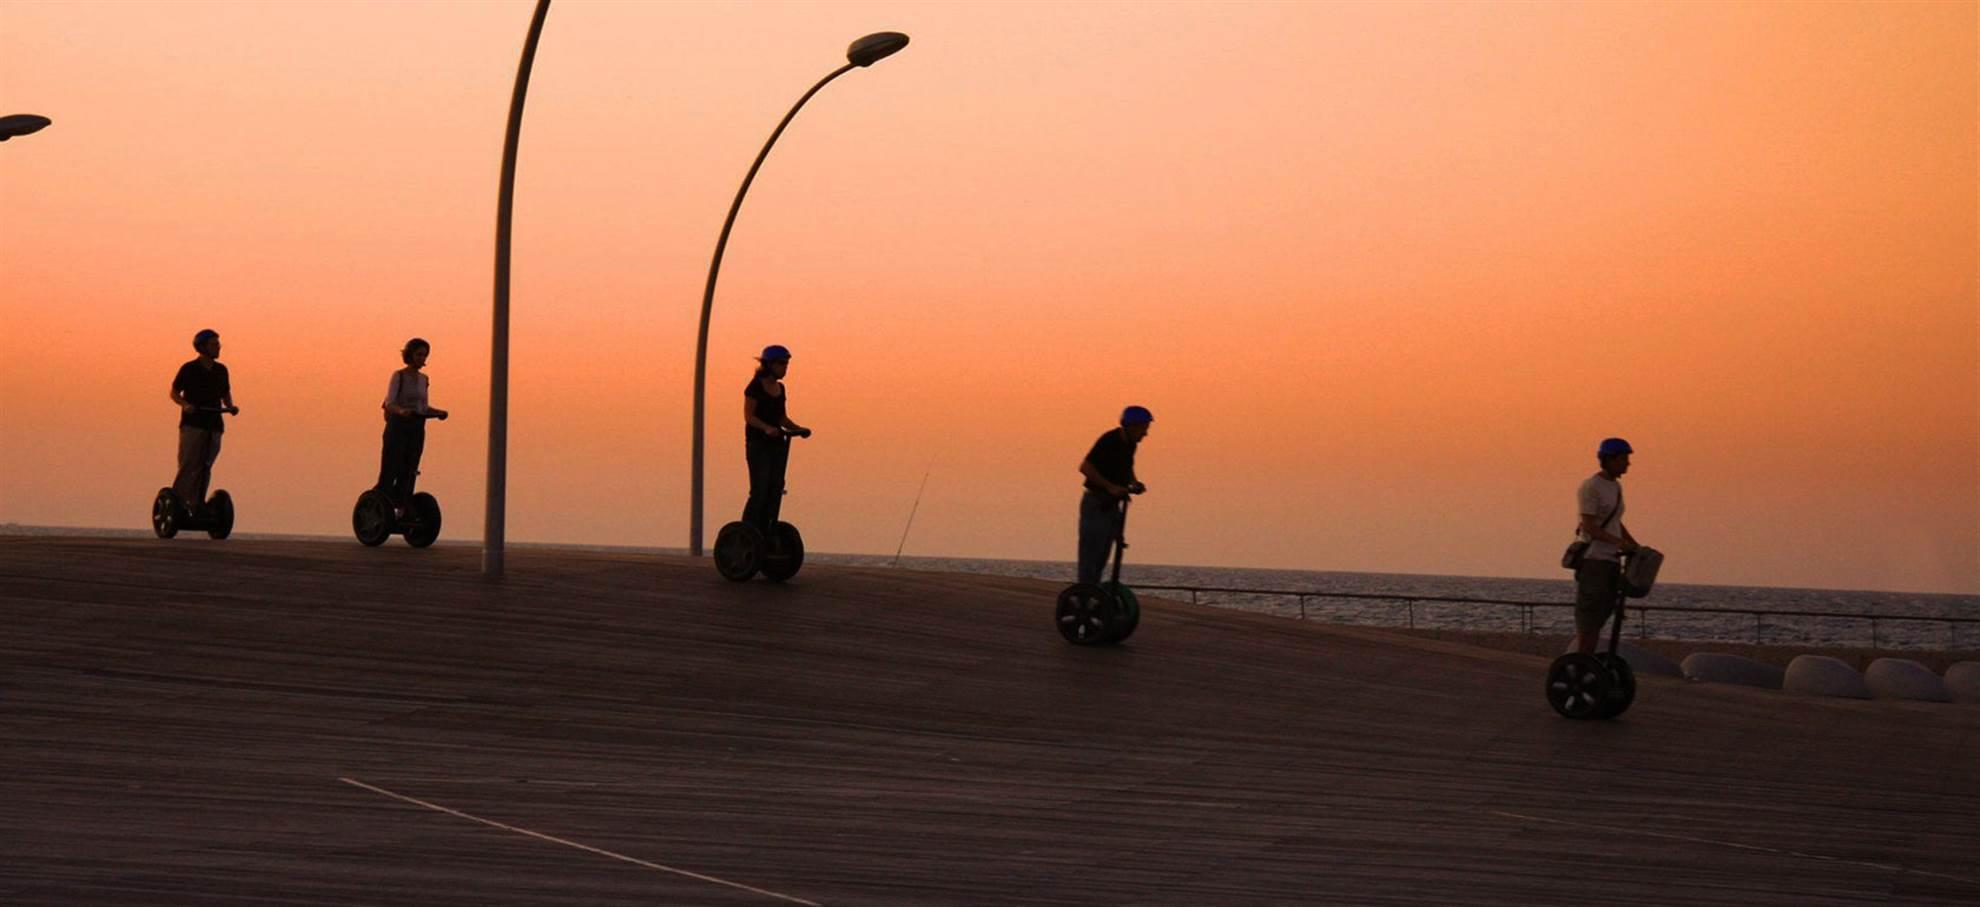 Segway Tour di Barcellona